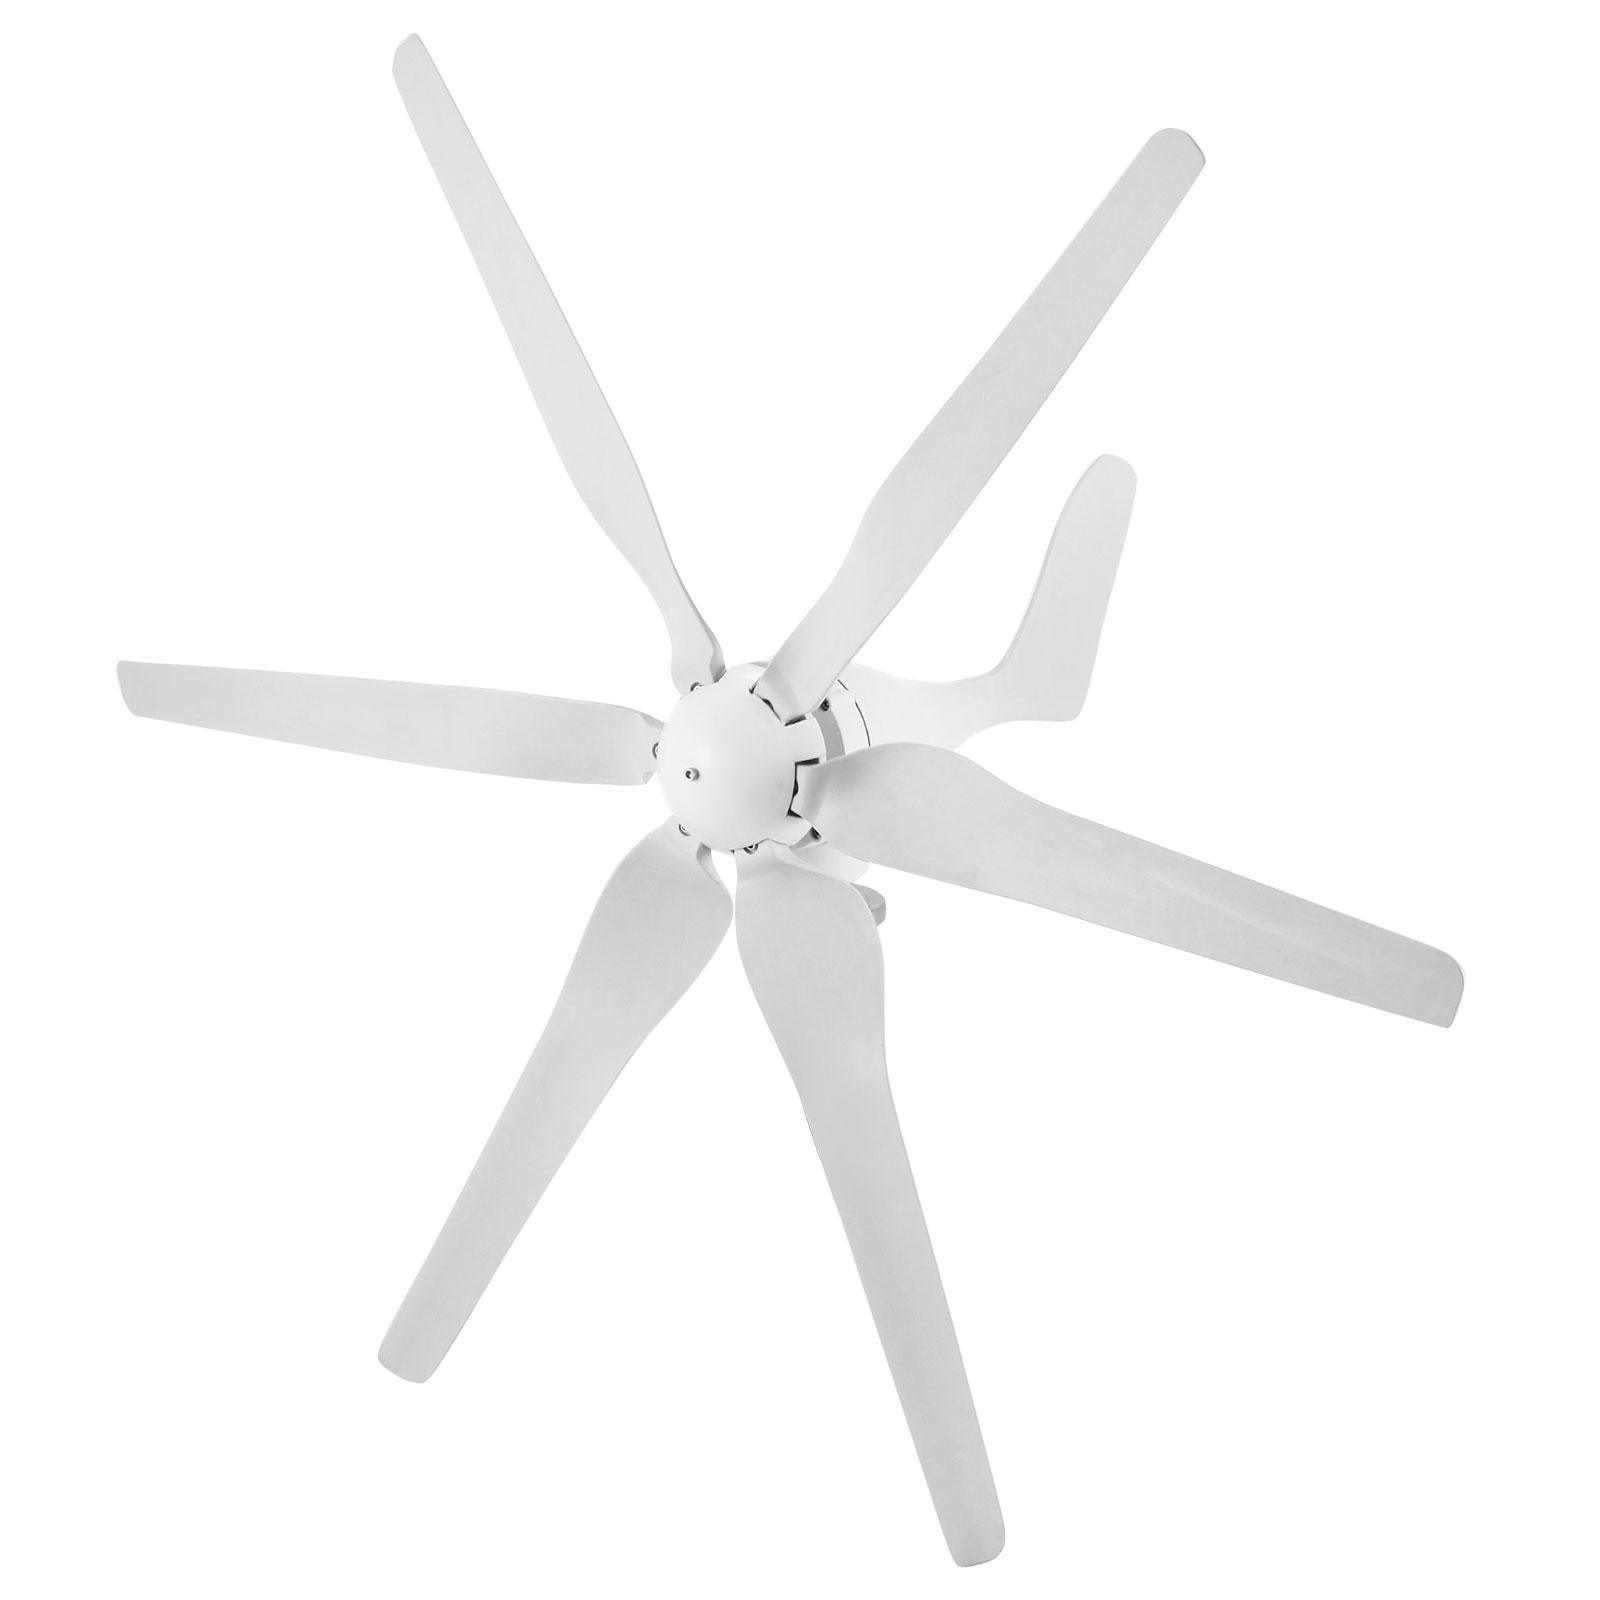 windenergieanlagen zum selber bauen ratgeber technik wind turbine generator kit ebay. Black Bedroom Furniture Sets. Home Design Ideas